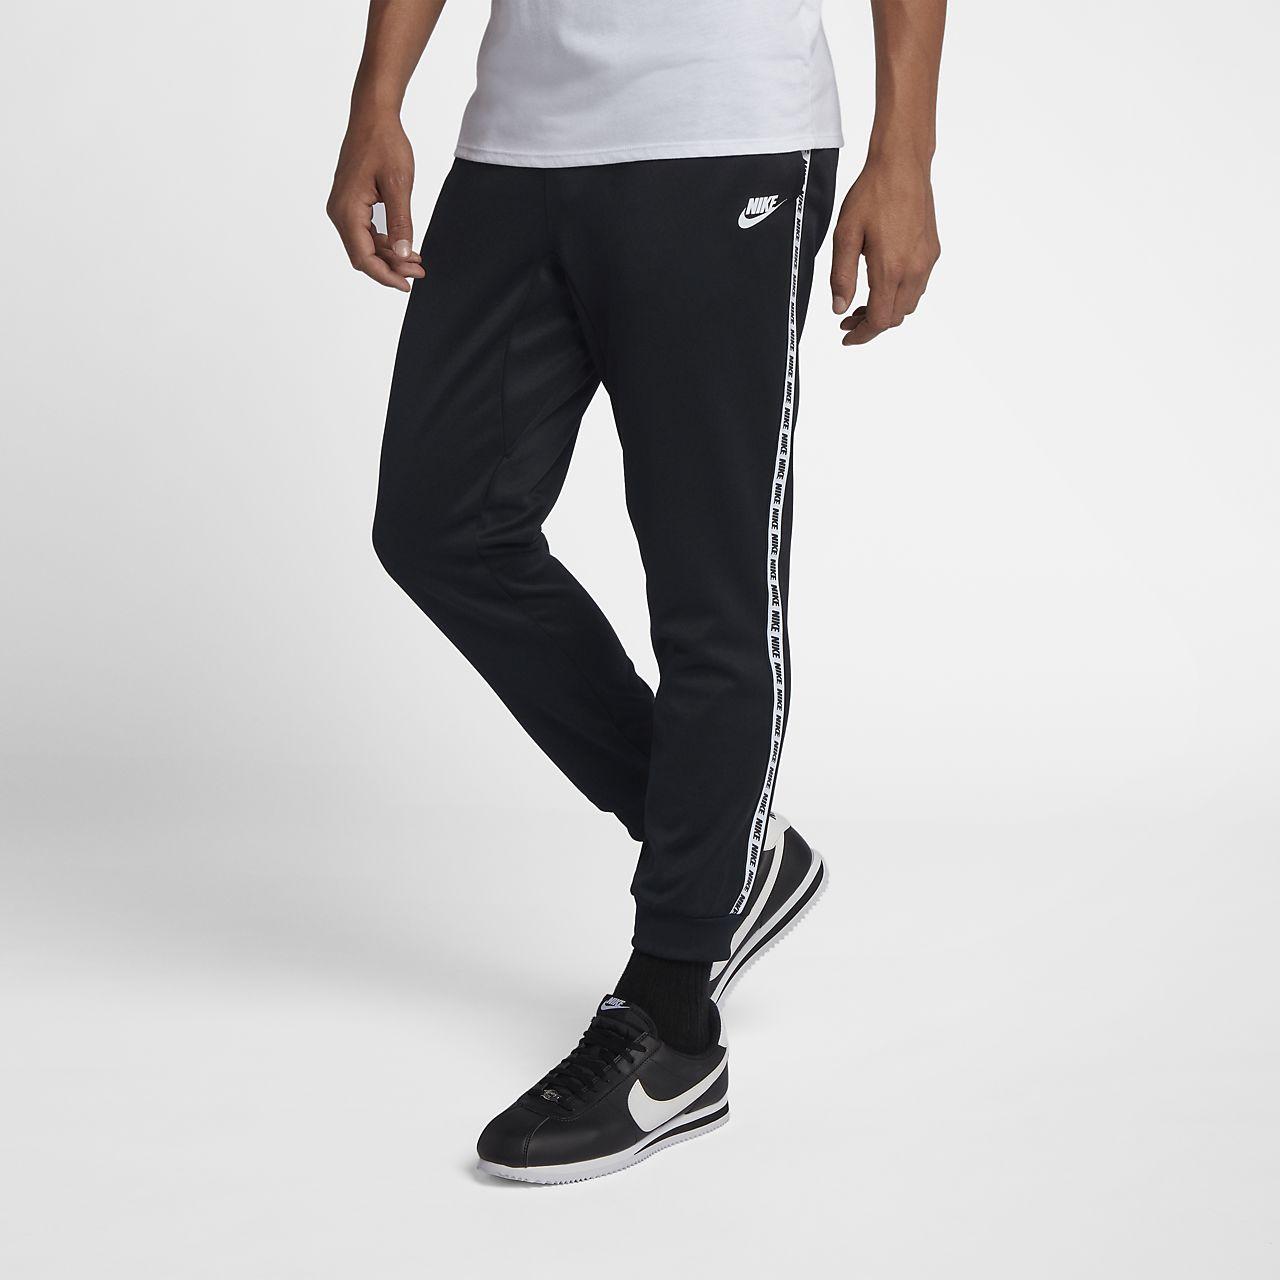 huge selection of cf88b e7ea0 ... Fleecebyxor Nike Sportswear för män